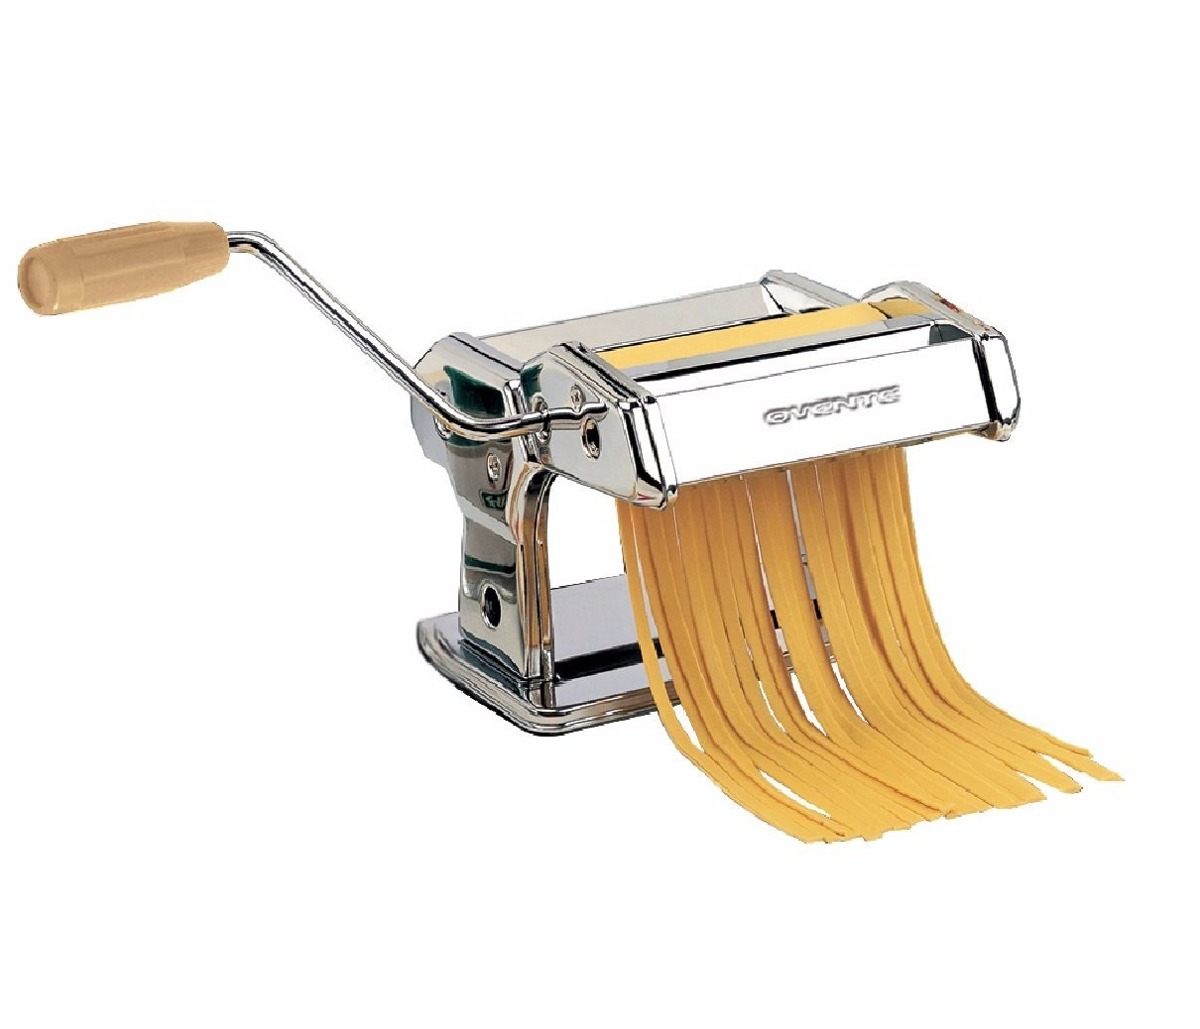 M quina laminadora para hacer pasta casera italiana ovente - Maquina para hacer pastas caseras ...